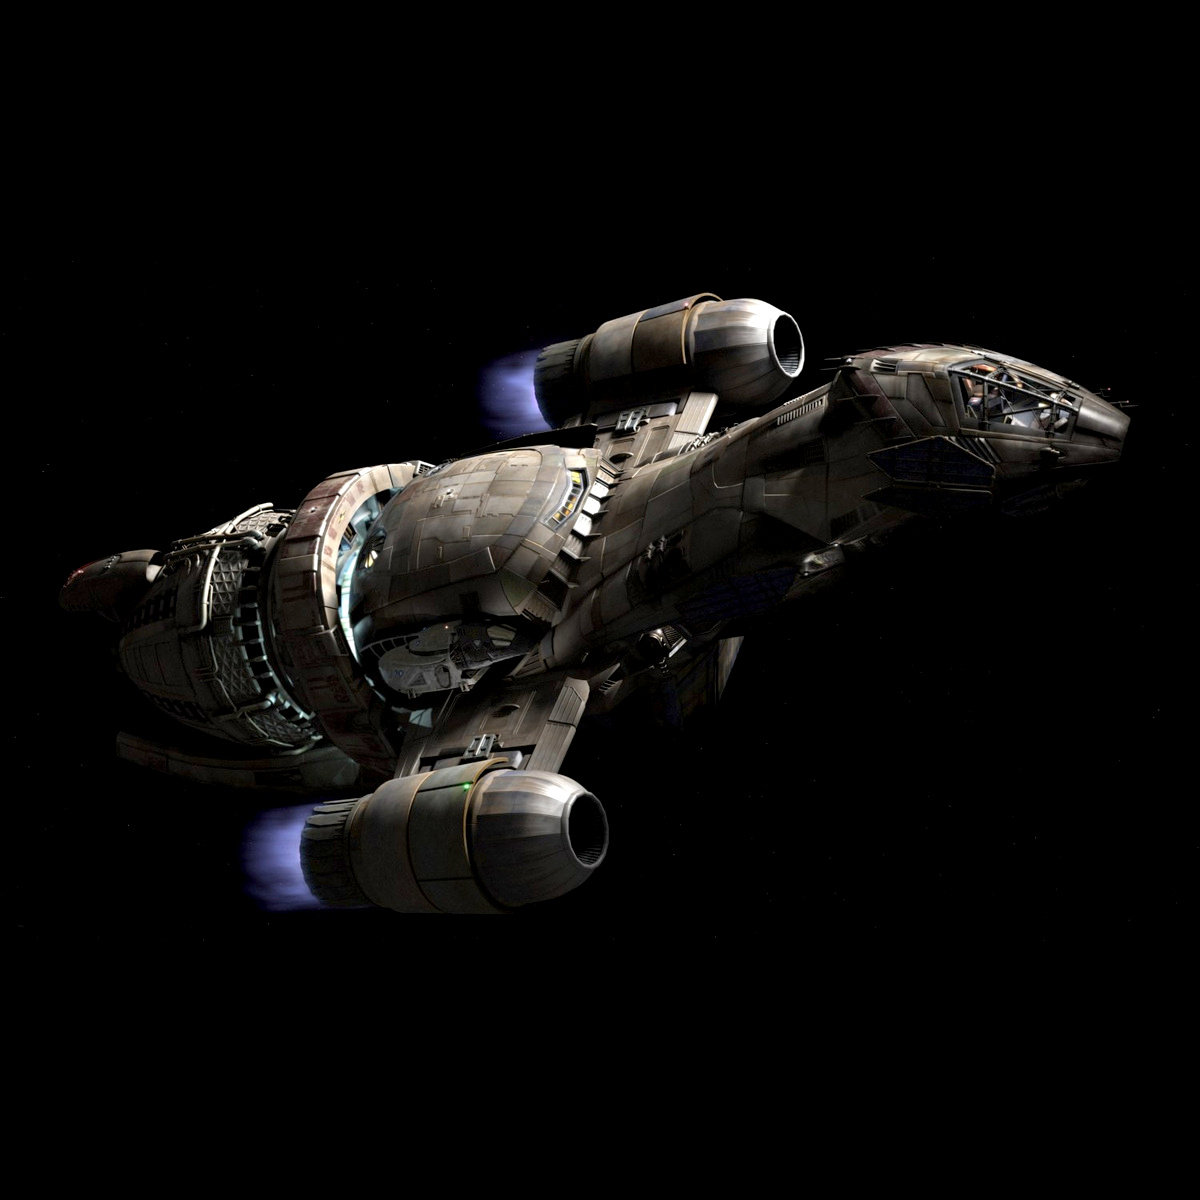 SpaceshipSerenity